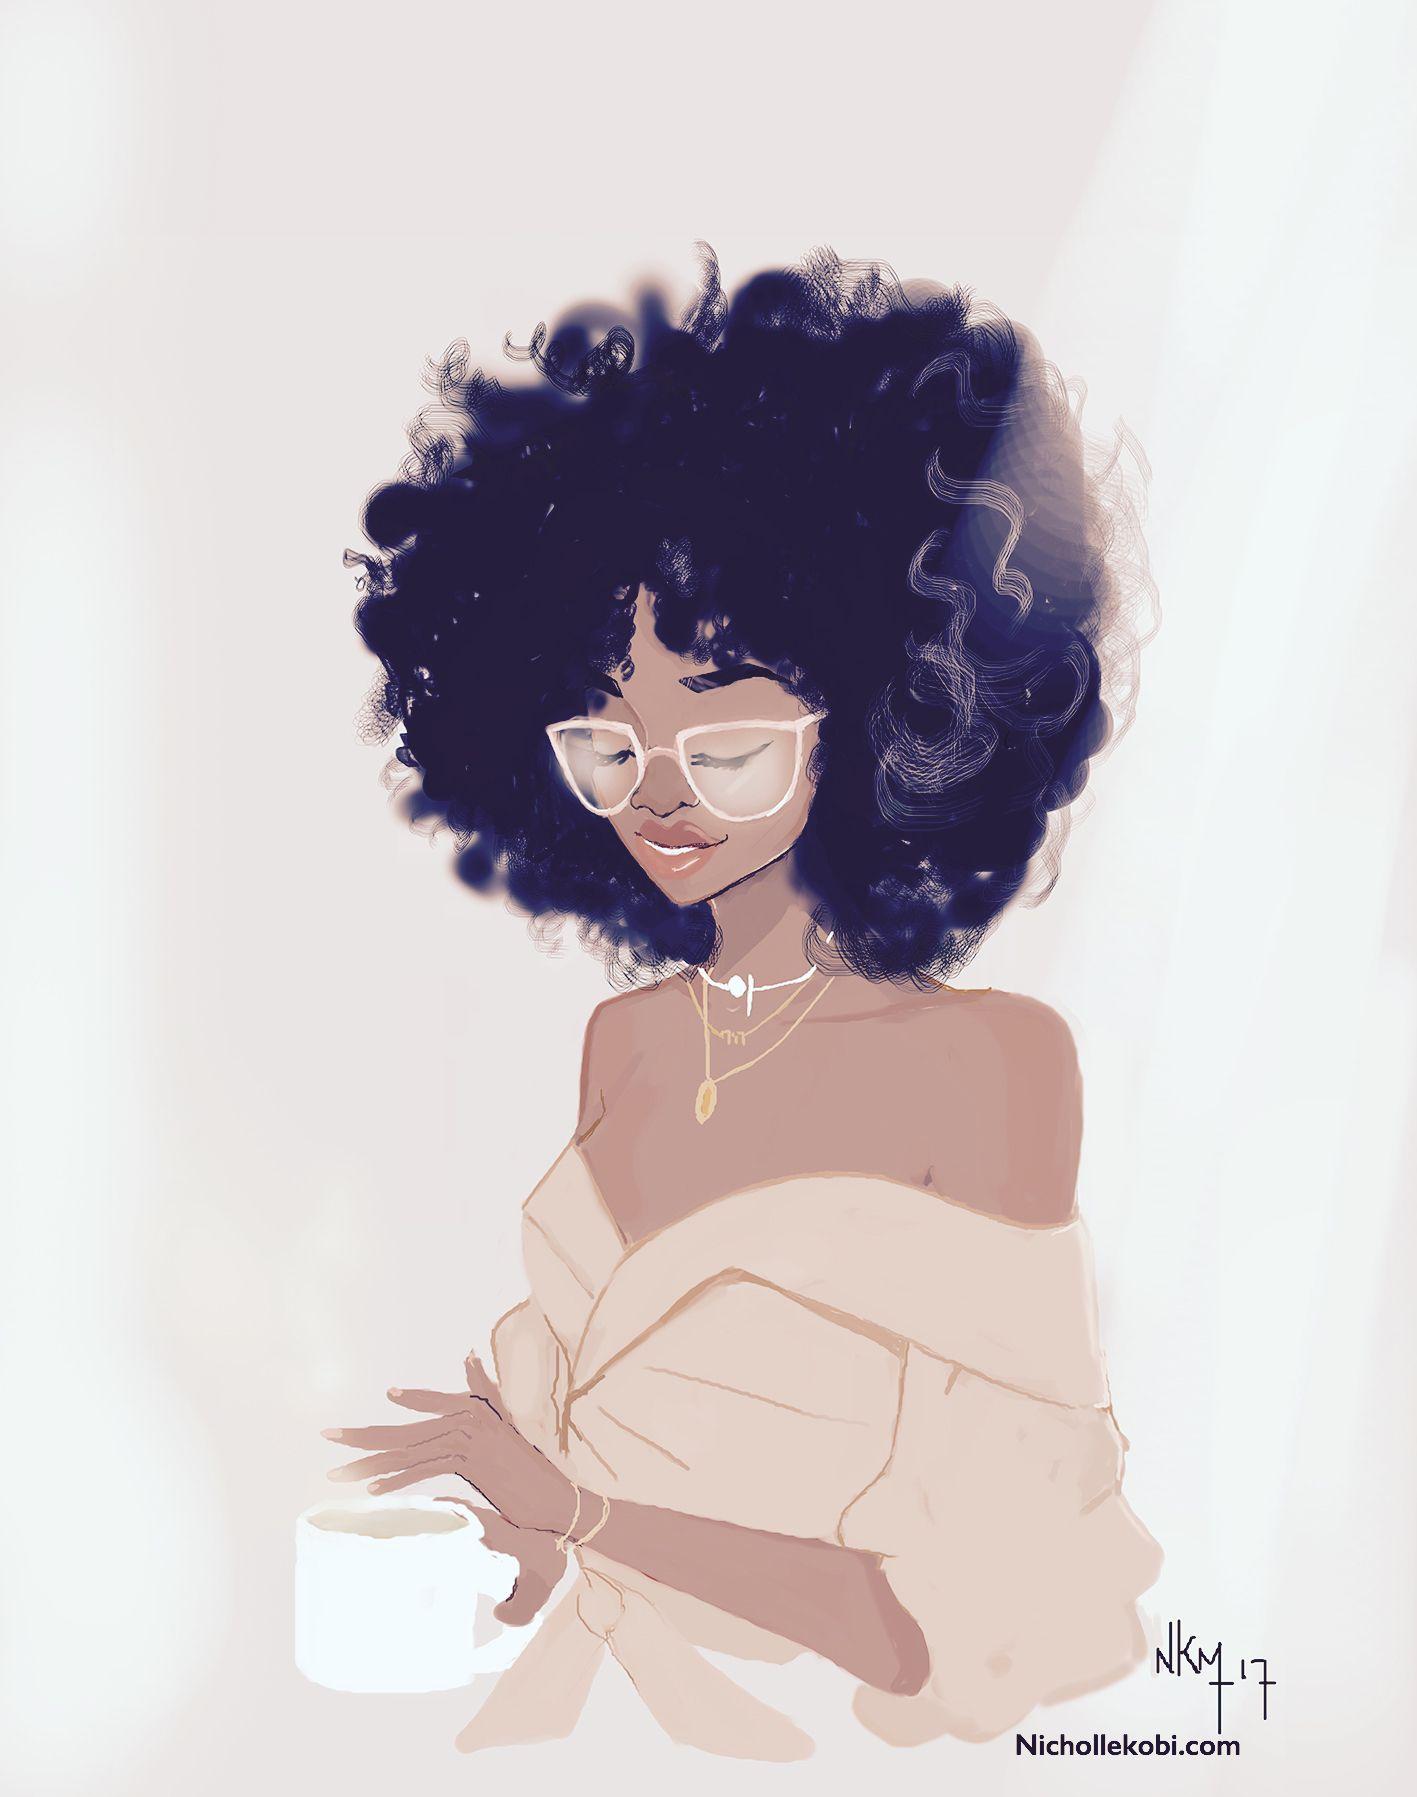 Image result for nicholle kobi excellence sketches